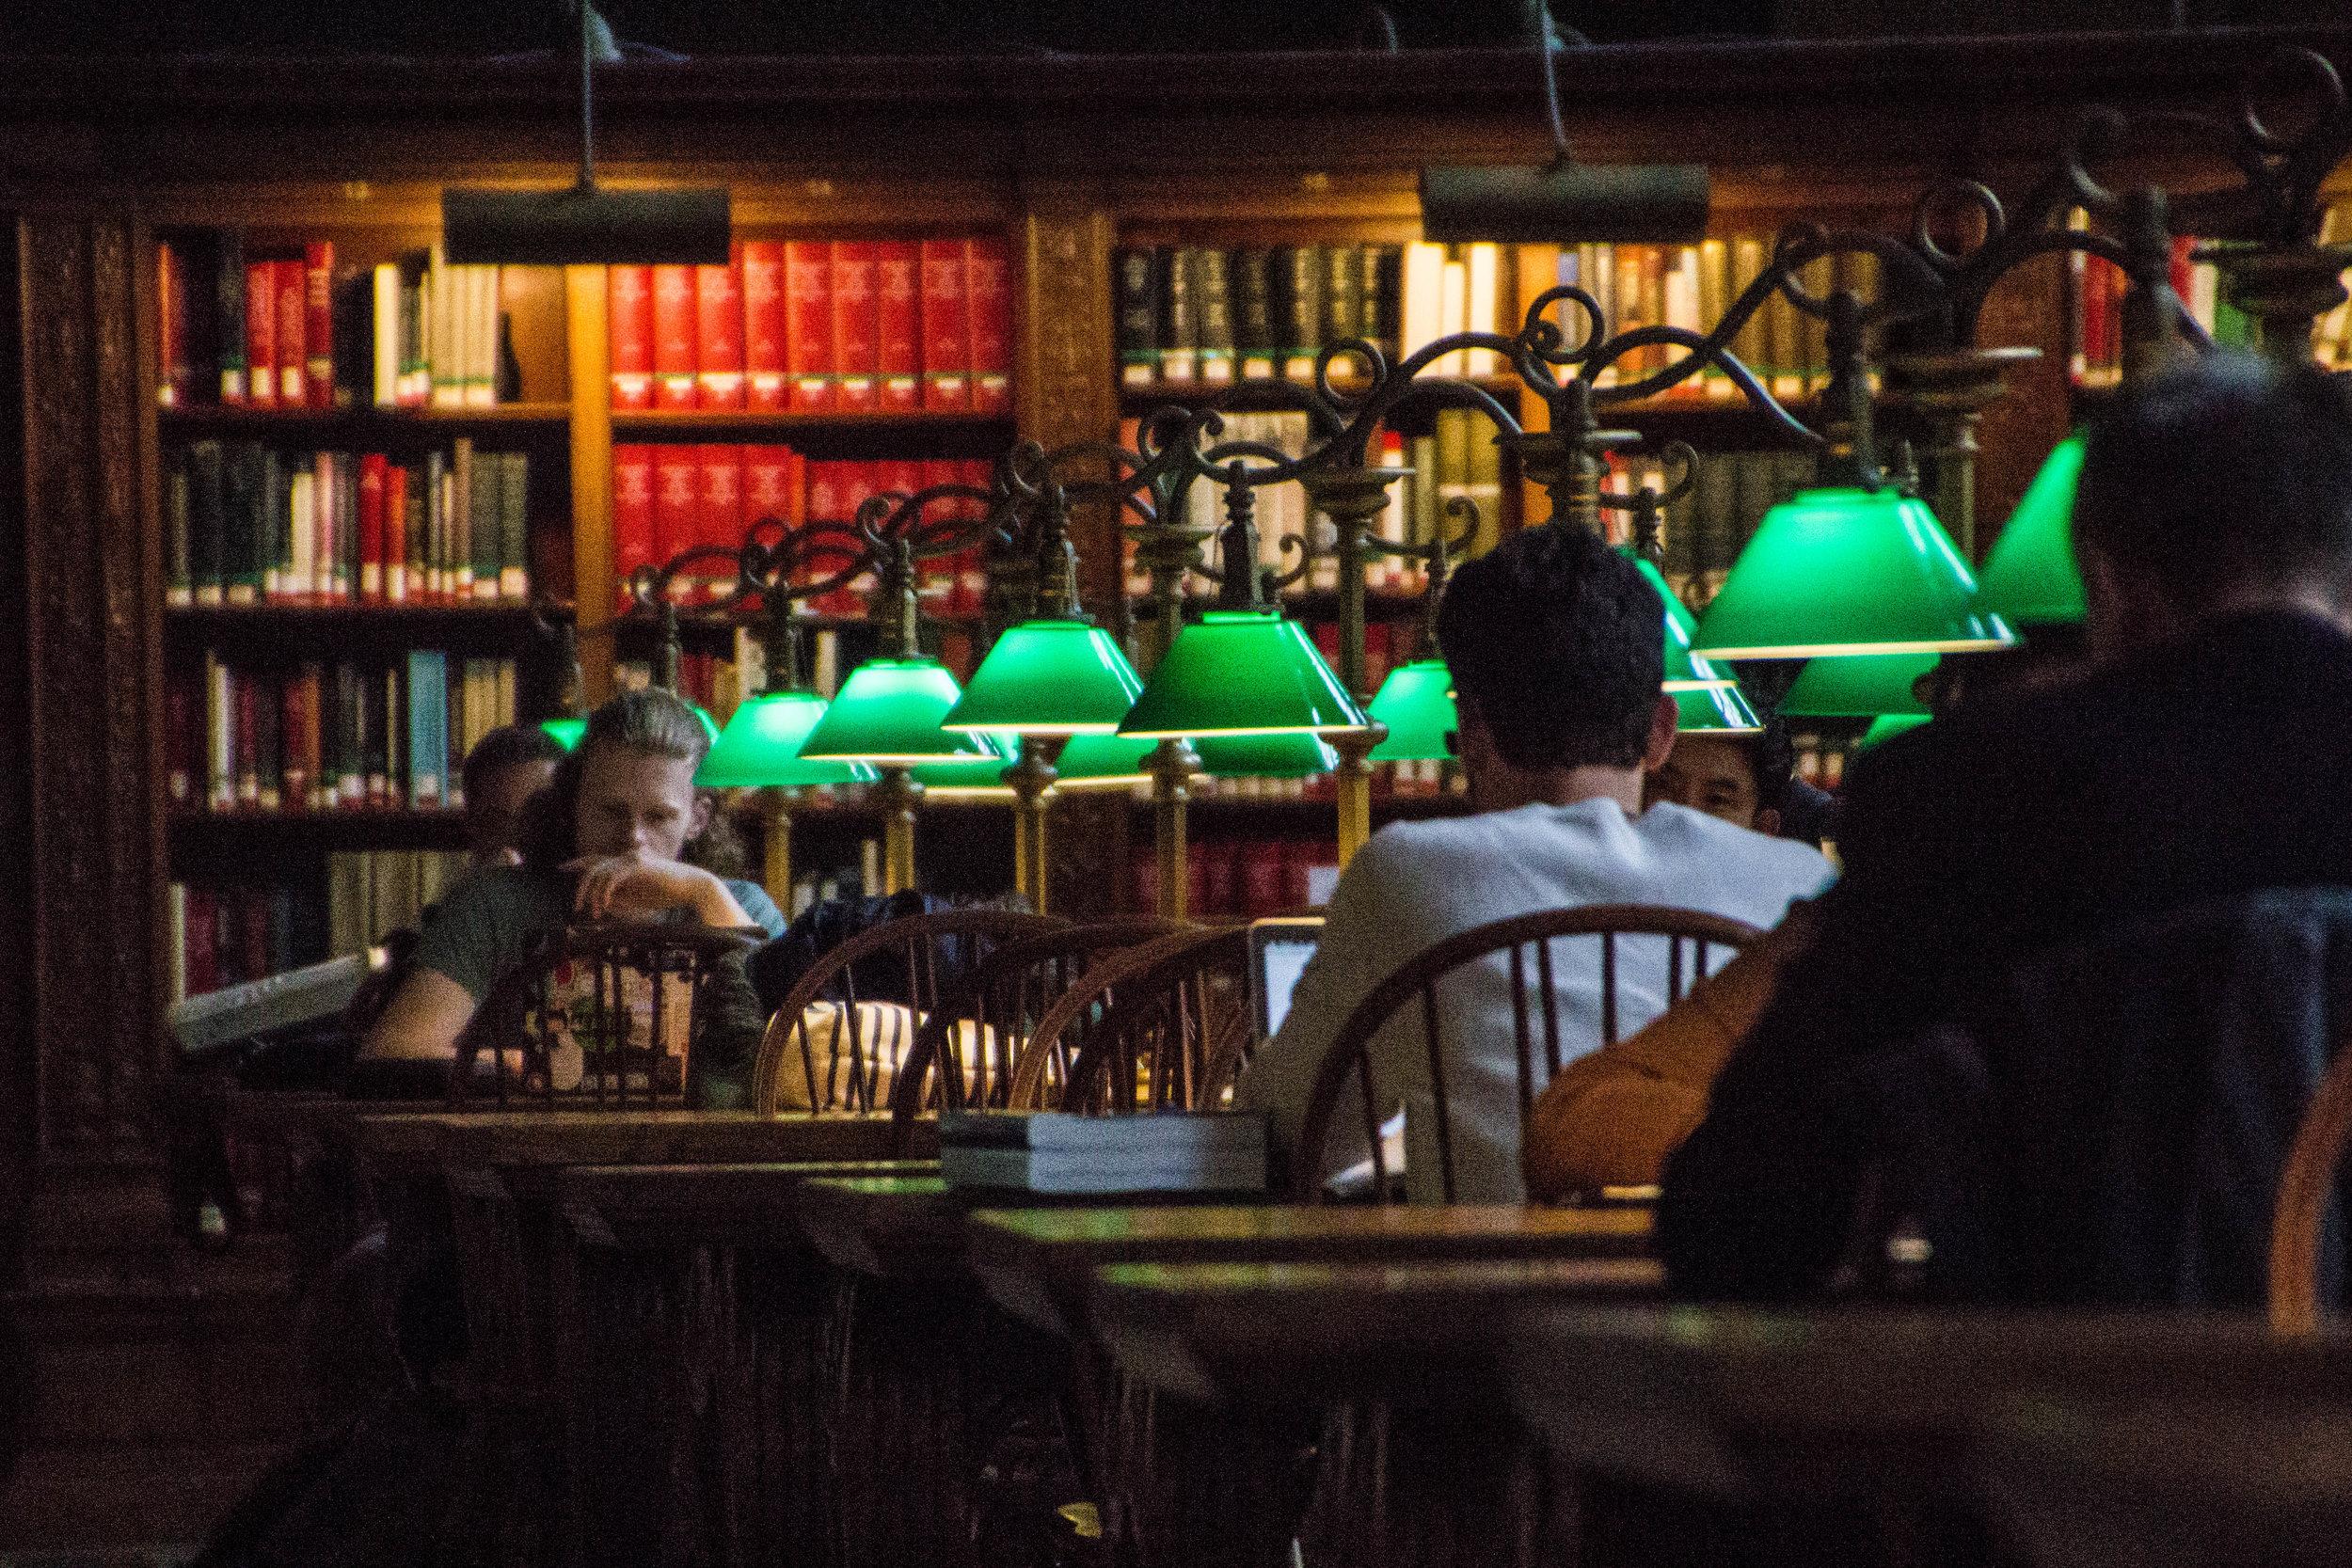 boston-public-library-photography-30.jpg